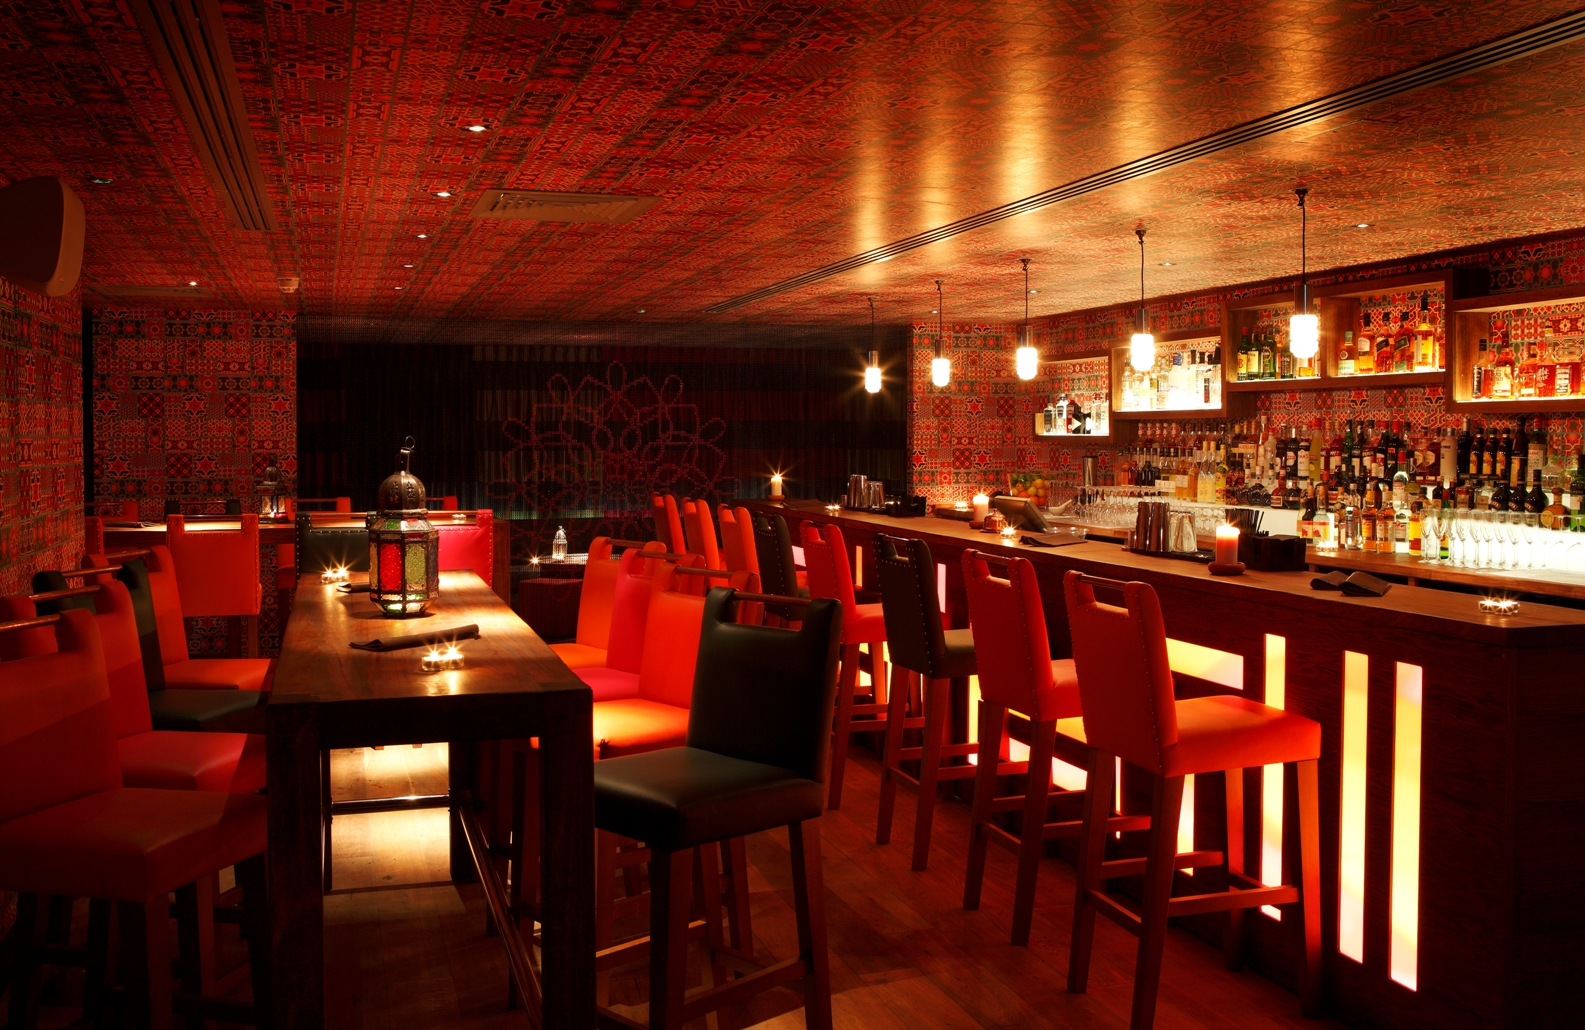 4 Restaurant Customer Loyalty Programs That Make Customers